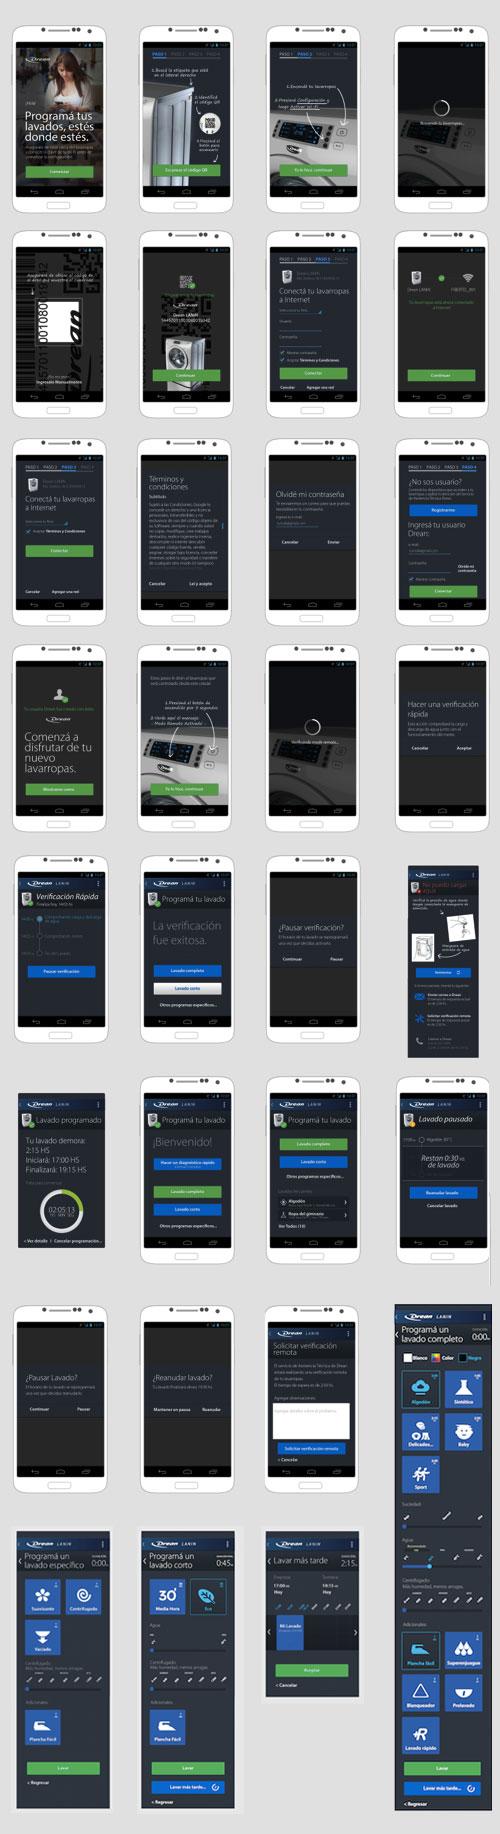 lb_case-iot_all-screens-mobile